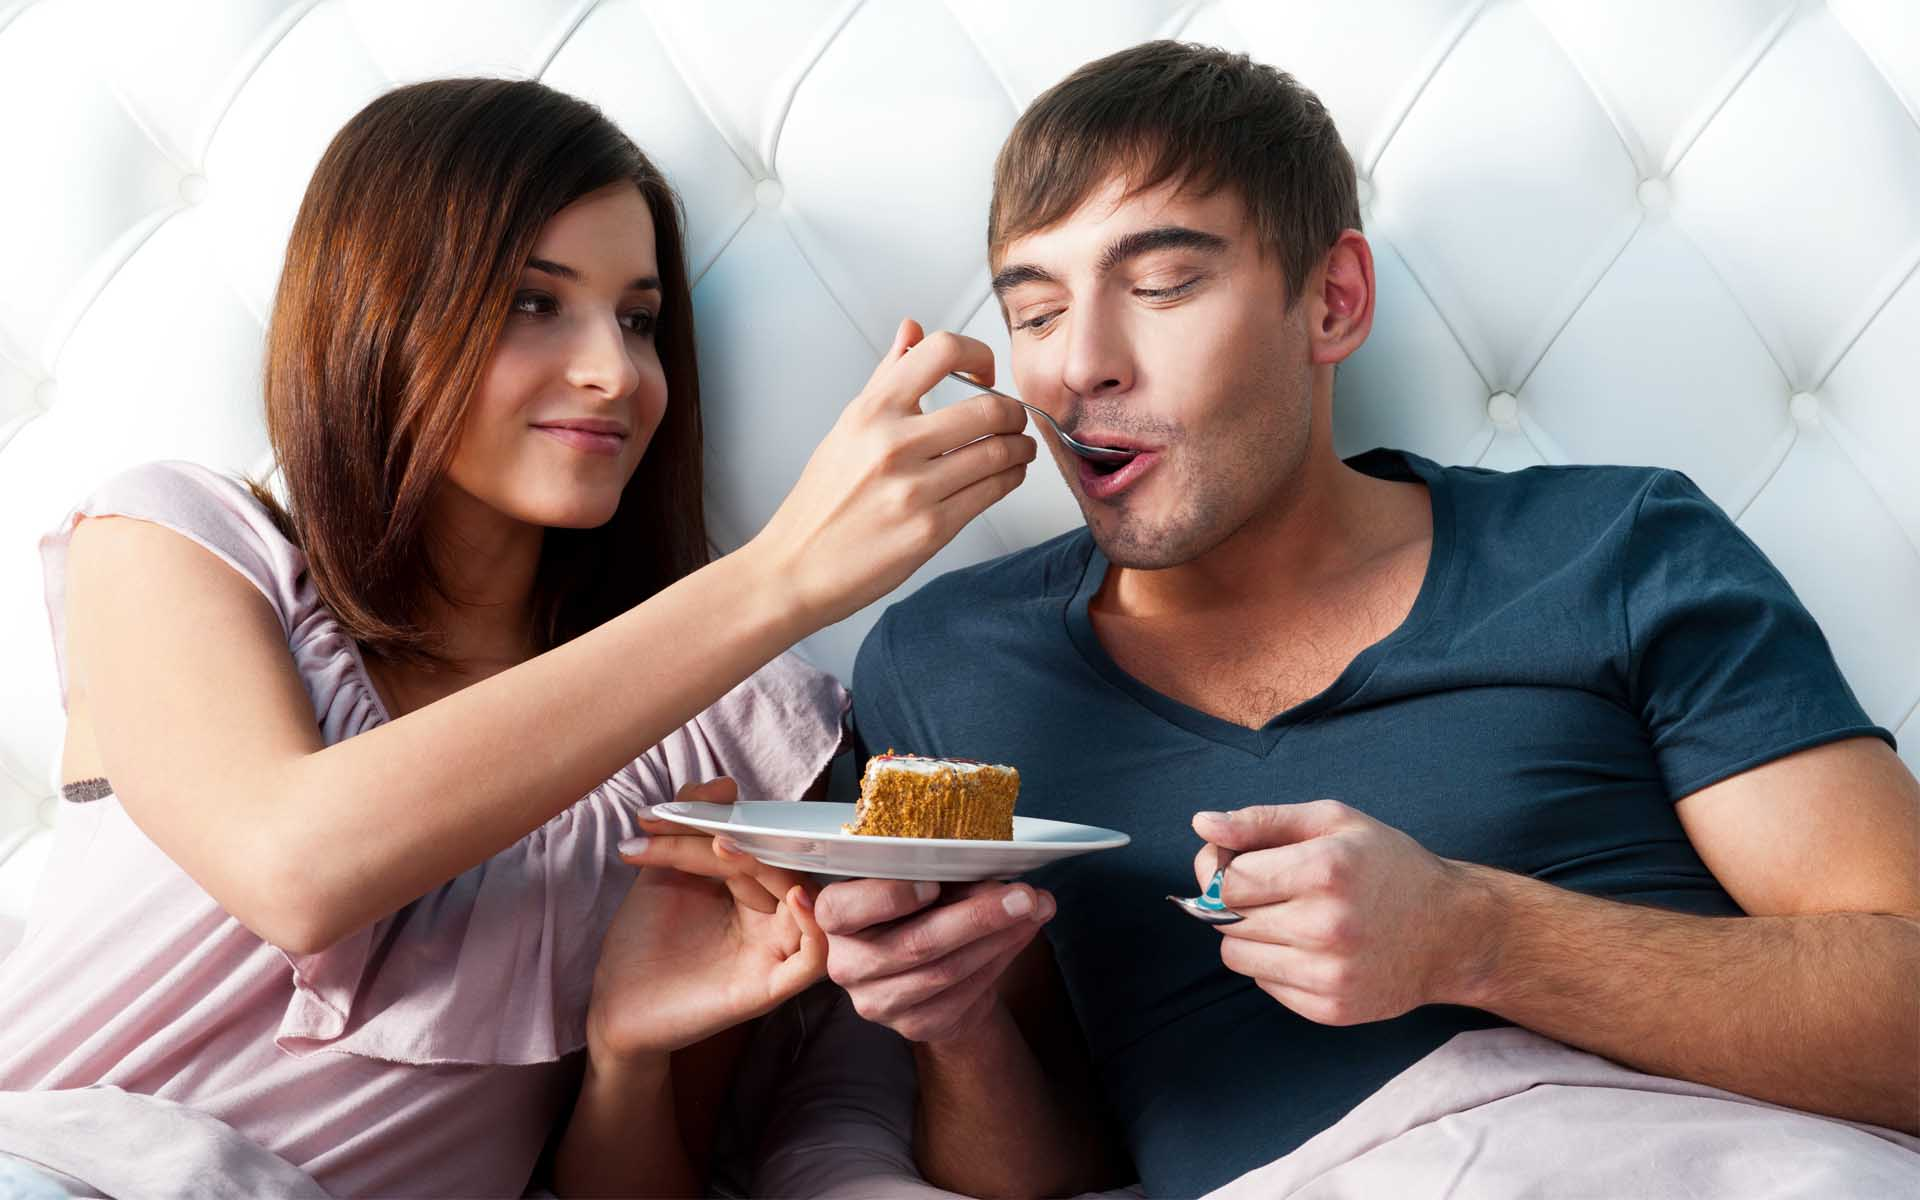 Развод или послушание